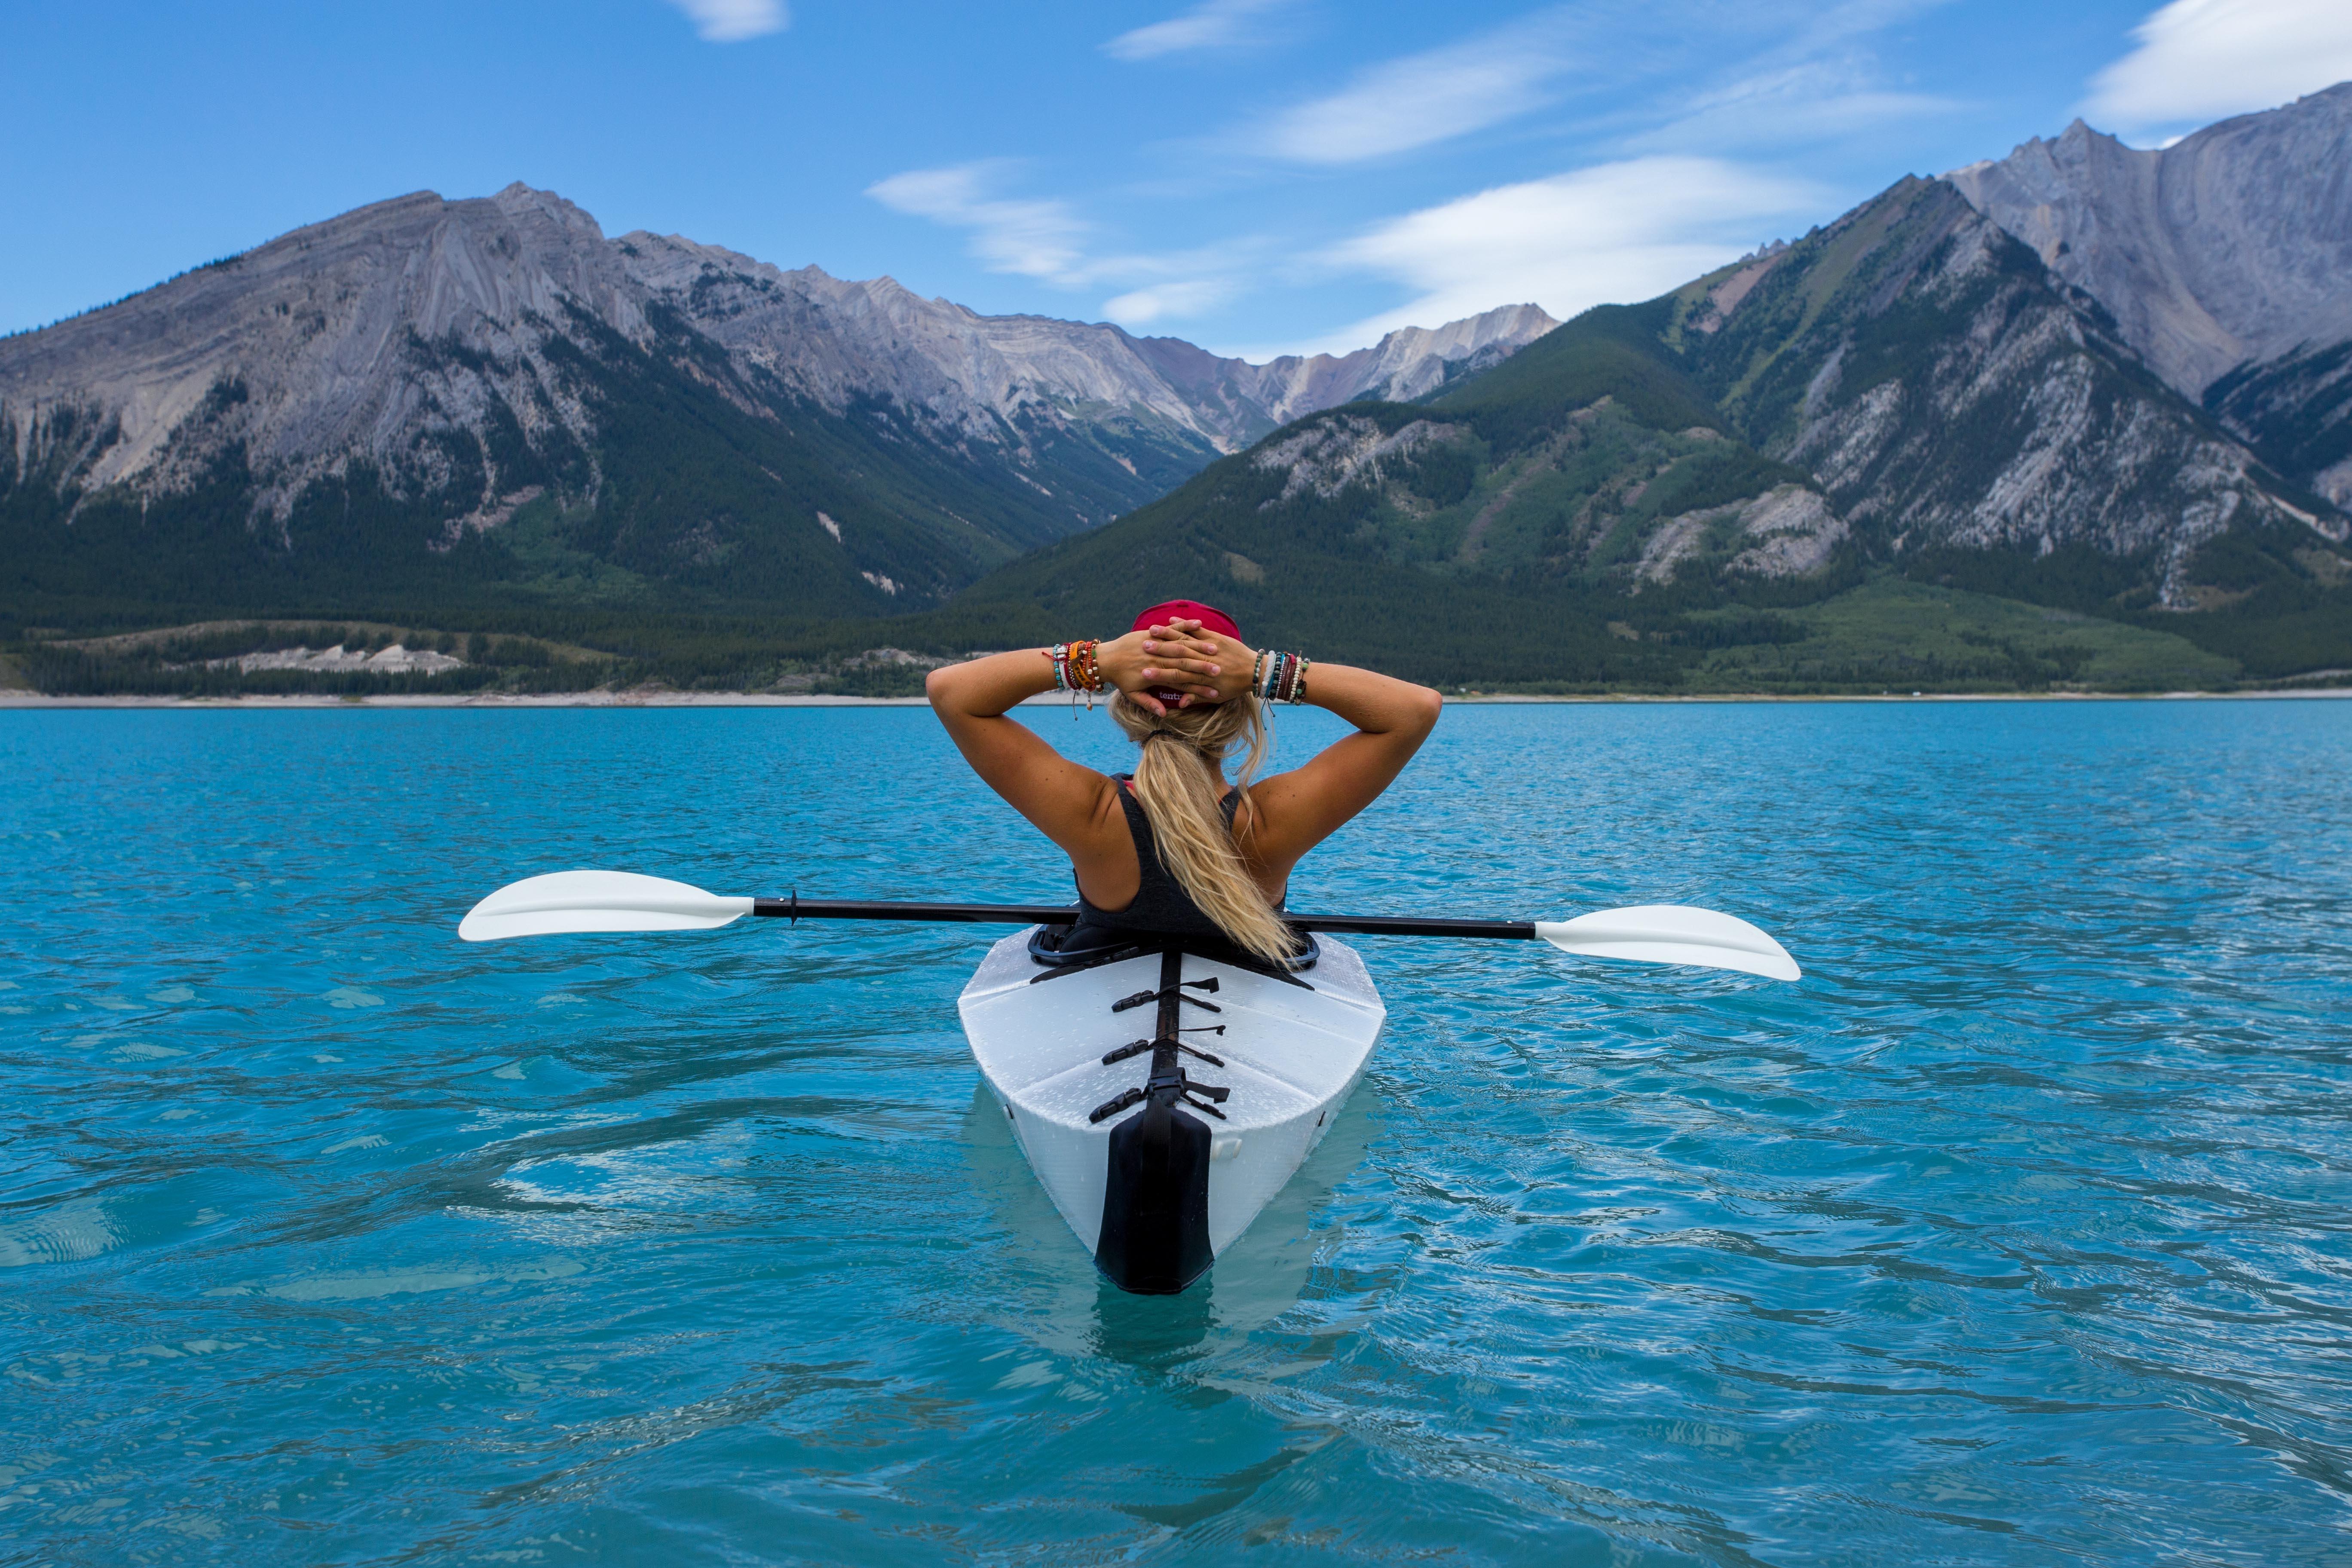 free images water mountain woman lake paddle vehicle extreme